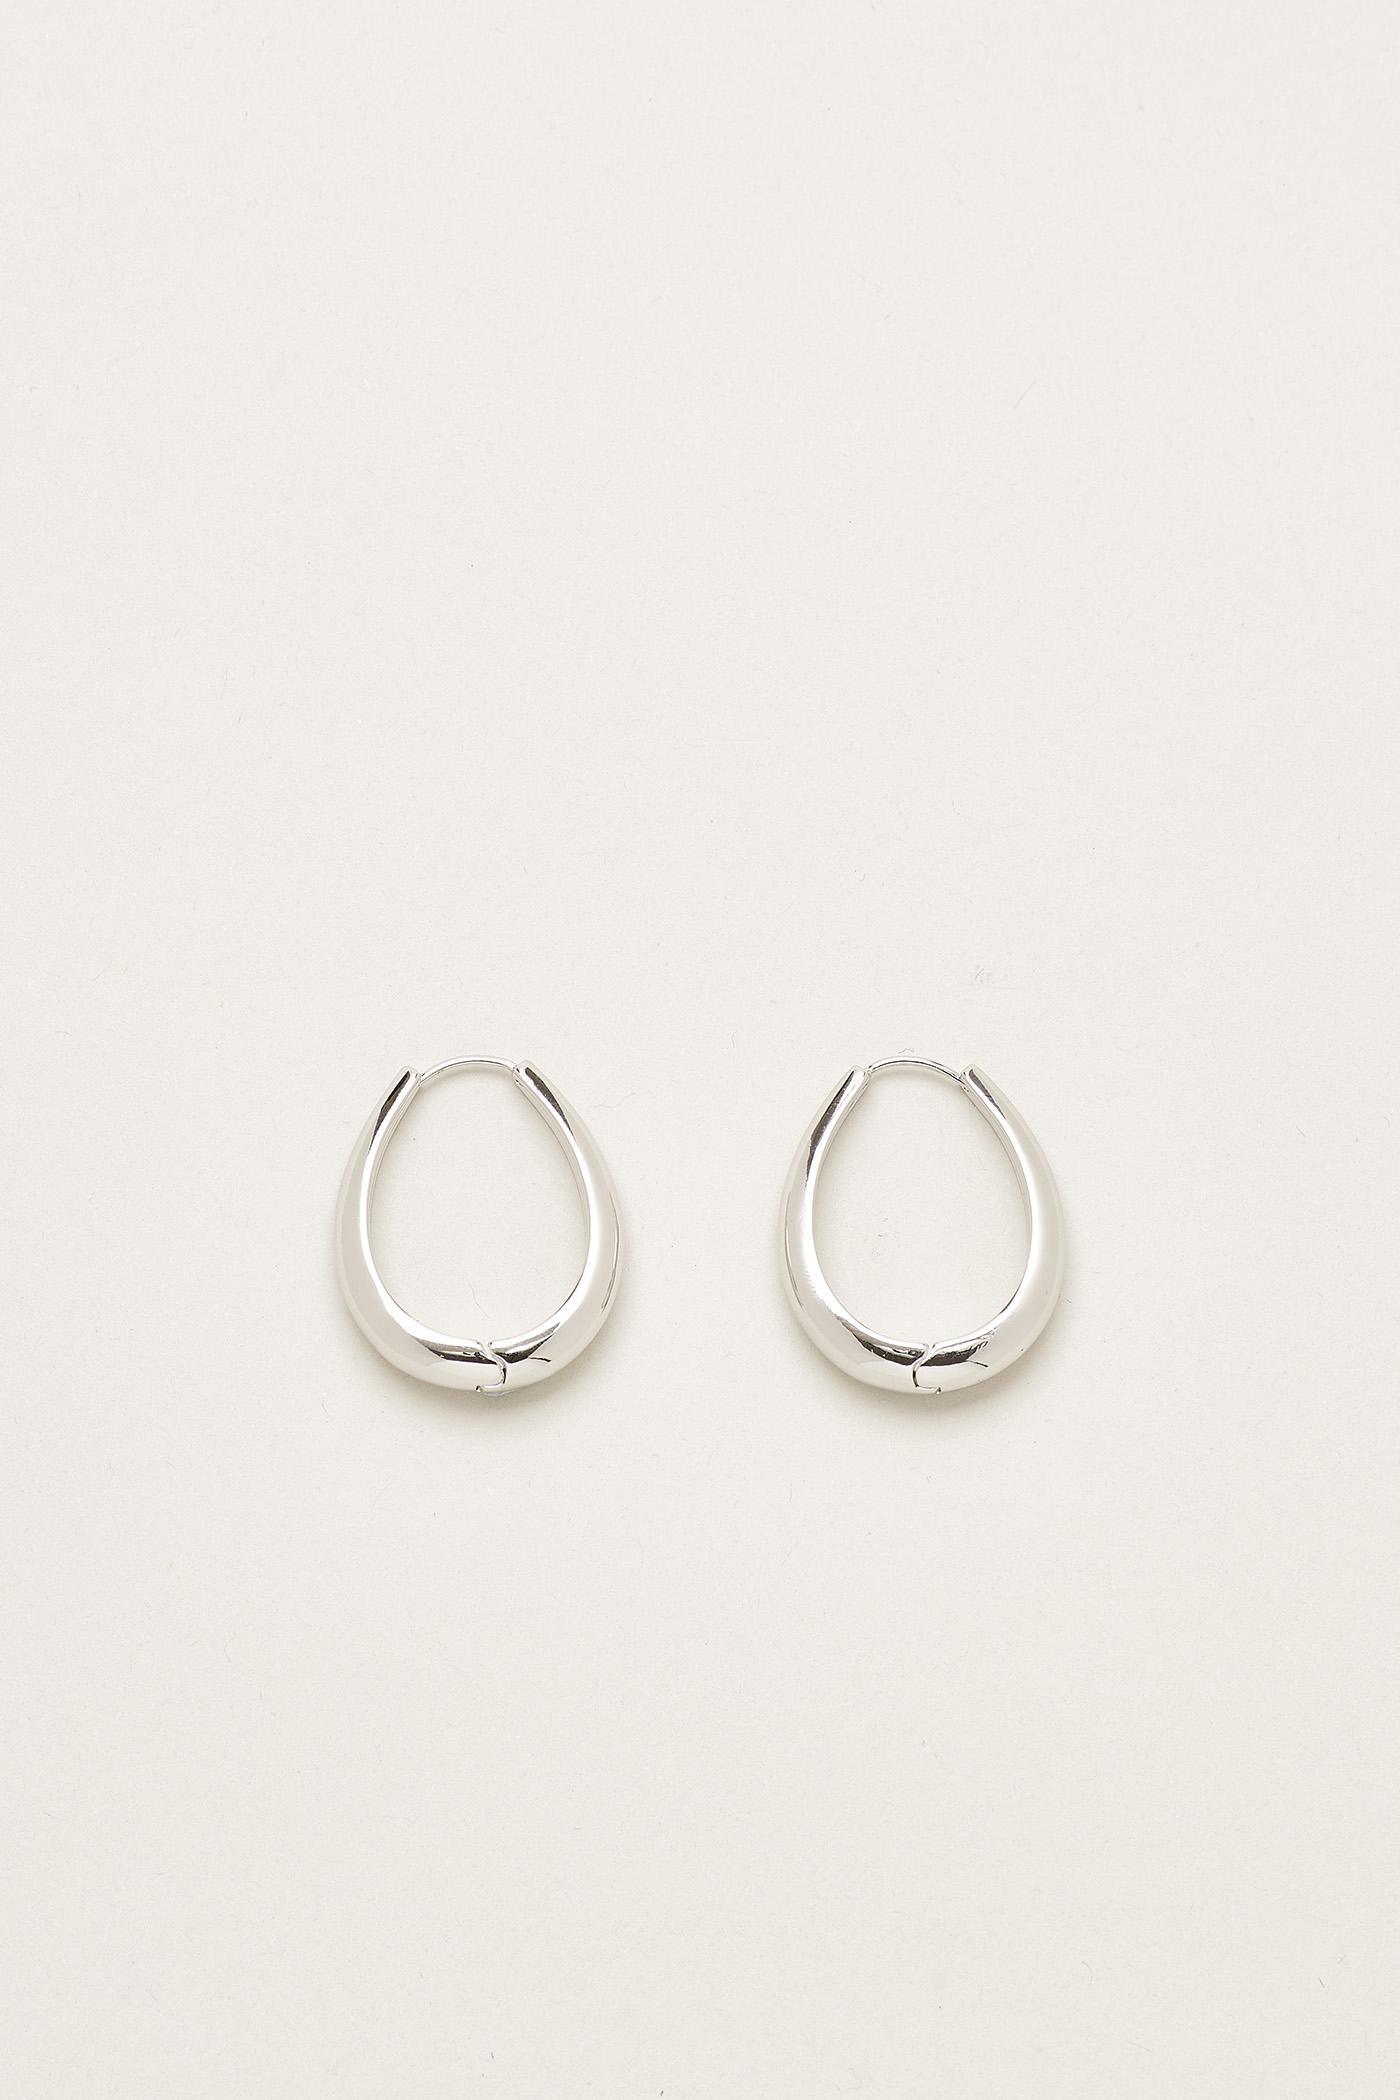 Gyda Hinge Earrings